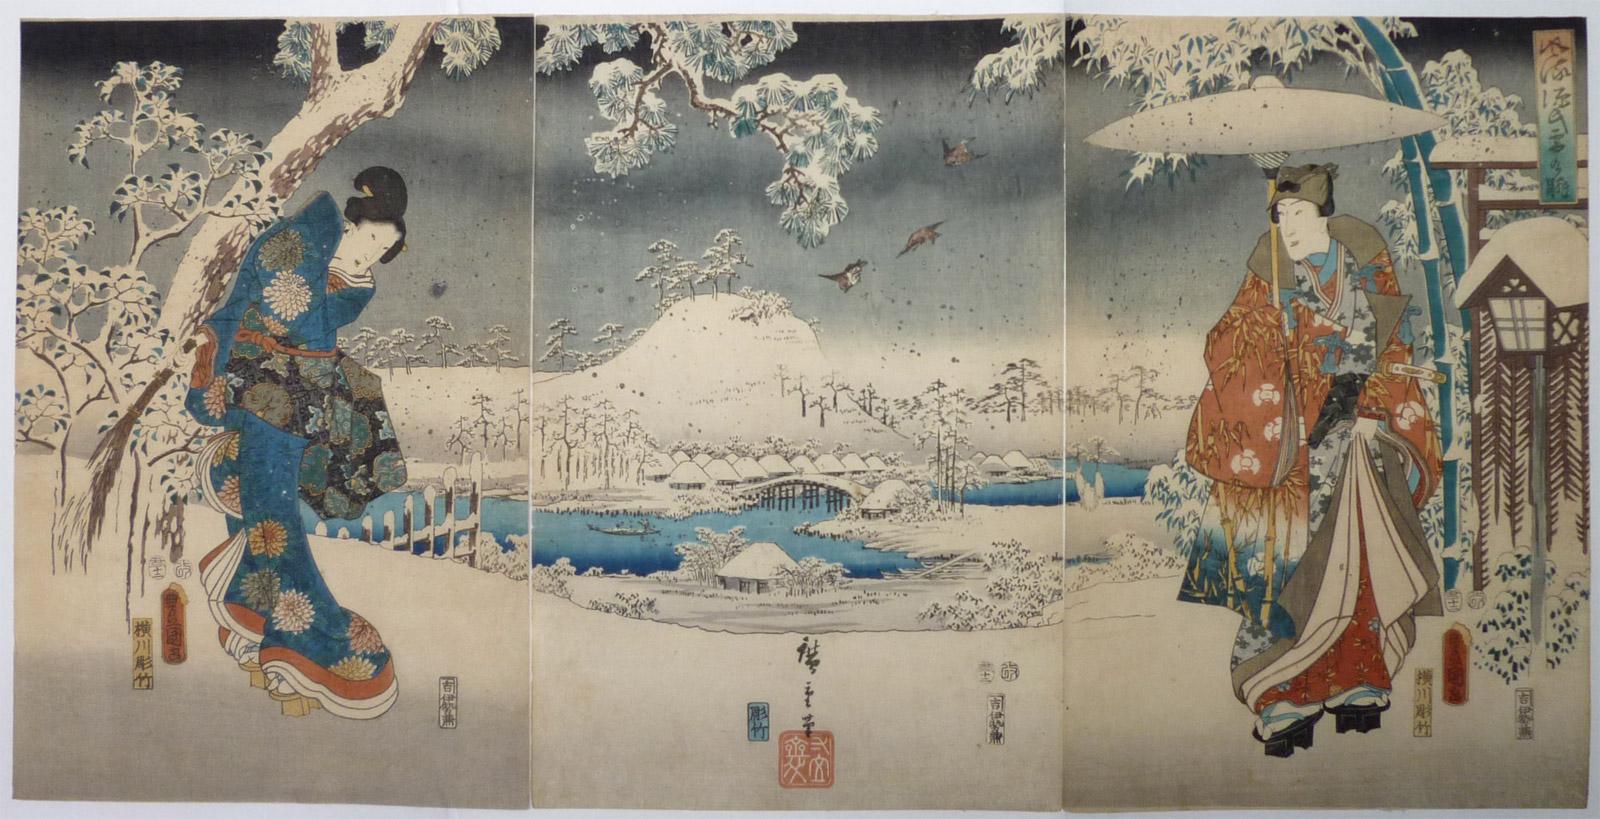 The Tale of Genji by Murasaki Shikibu Essay